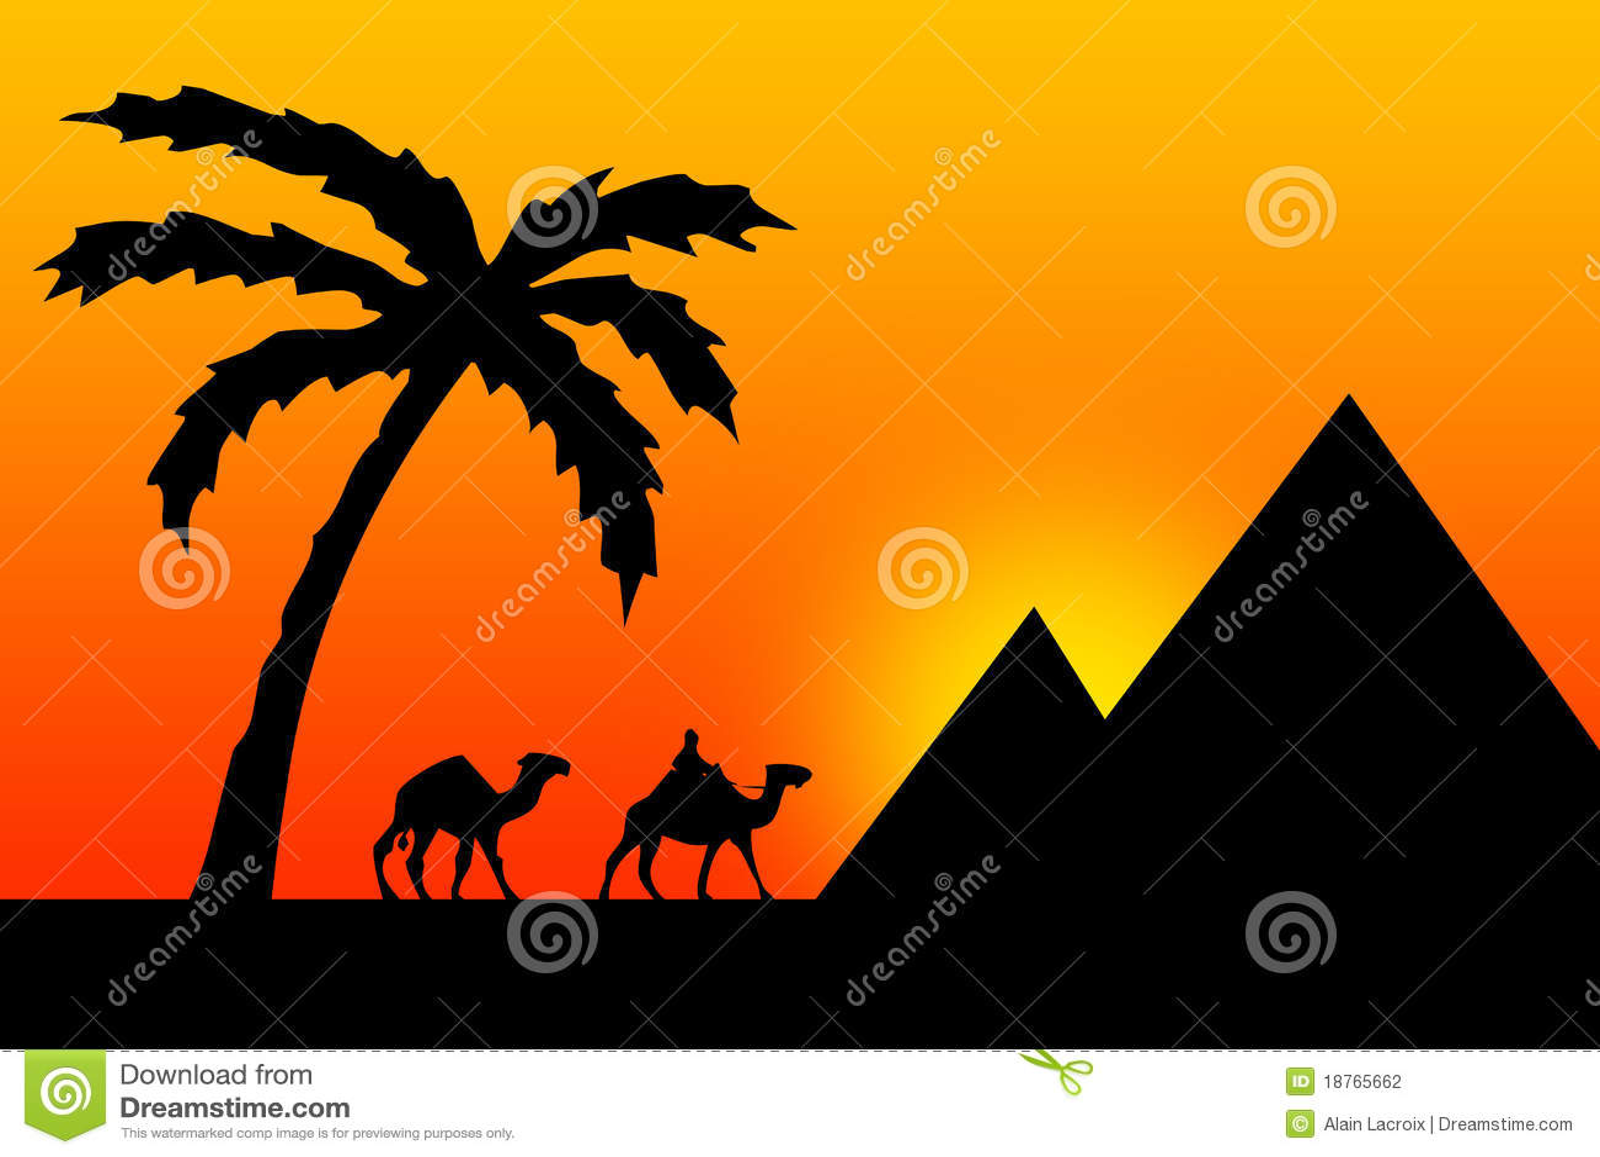 egypt sunset stock illustration image of building  arid clipart sunrise service black and white clip art sunrise background images